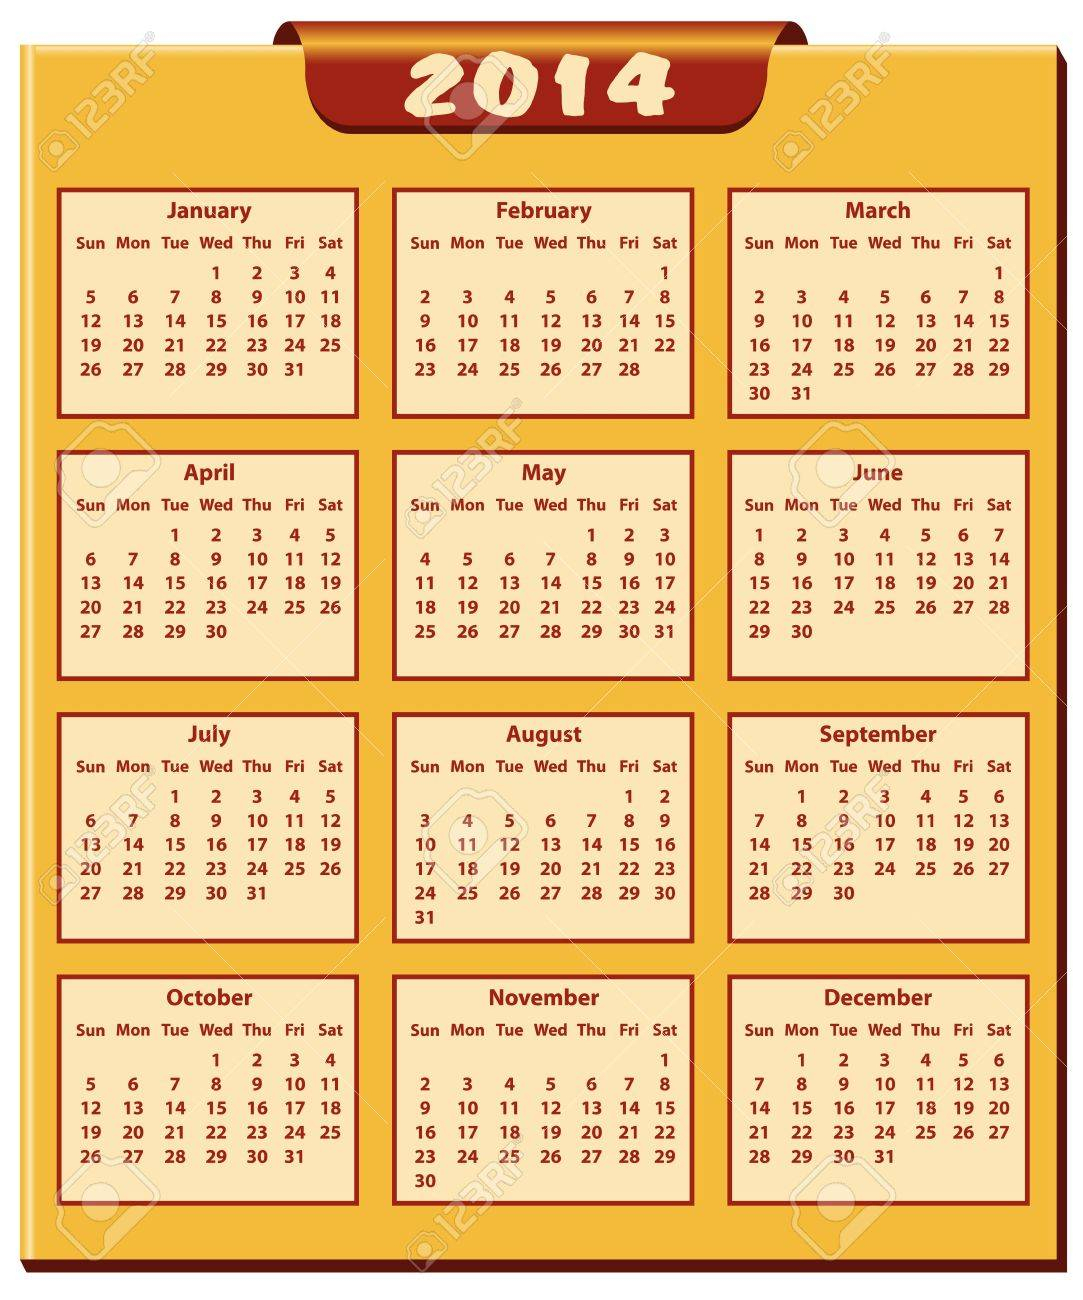 Calendar 2014 Full Year. January Through To December Months.